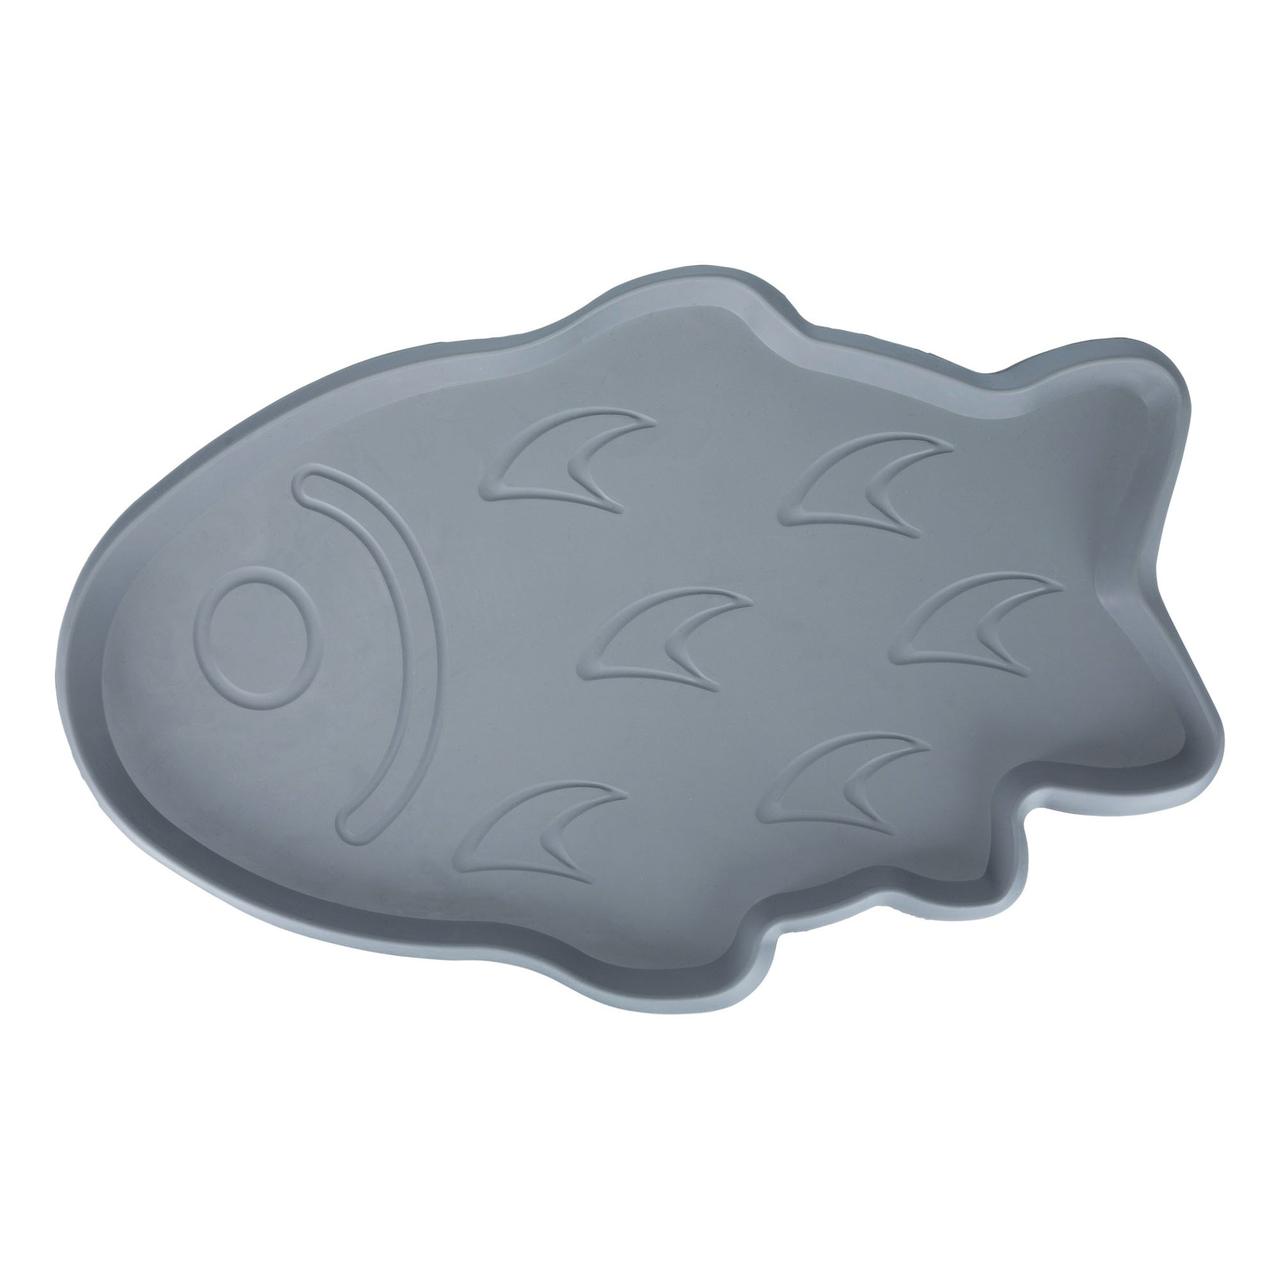 Коврик под миску Trixie 35 см / 22 см (серый)